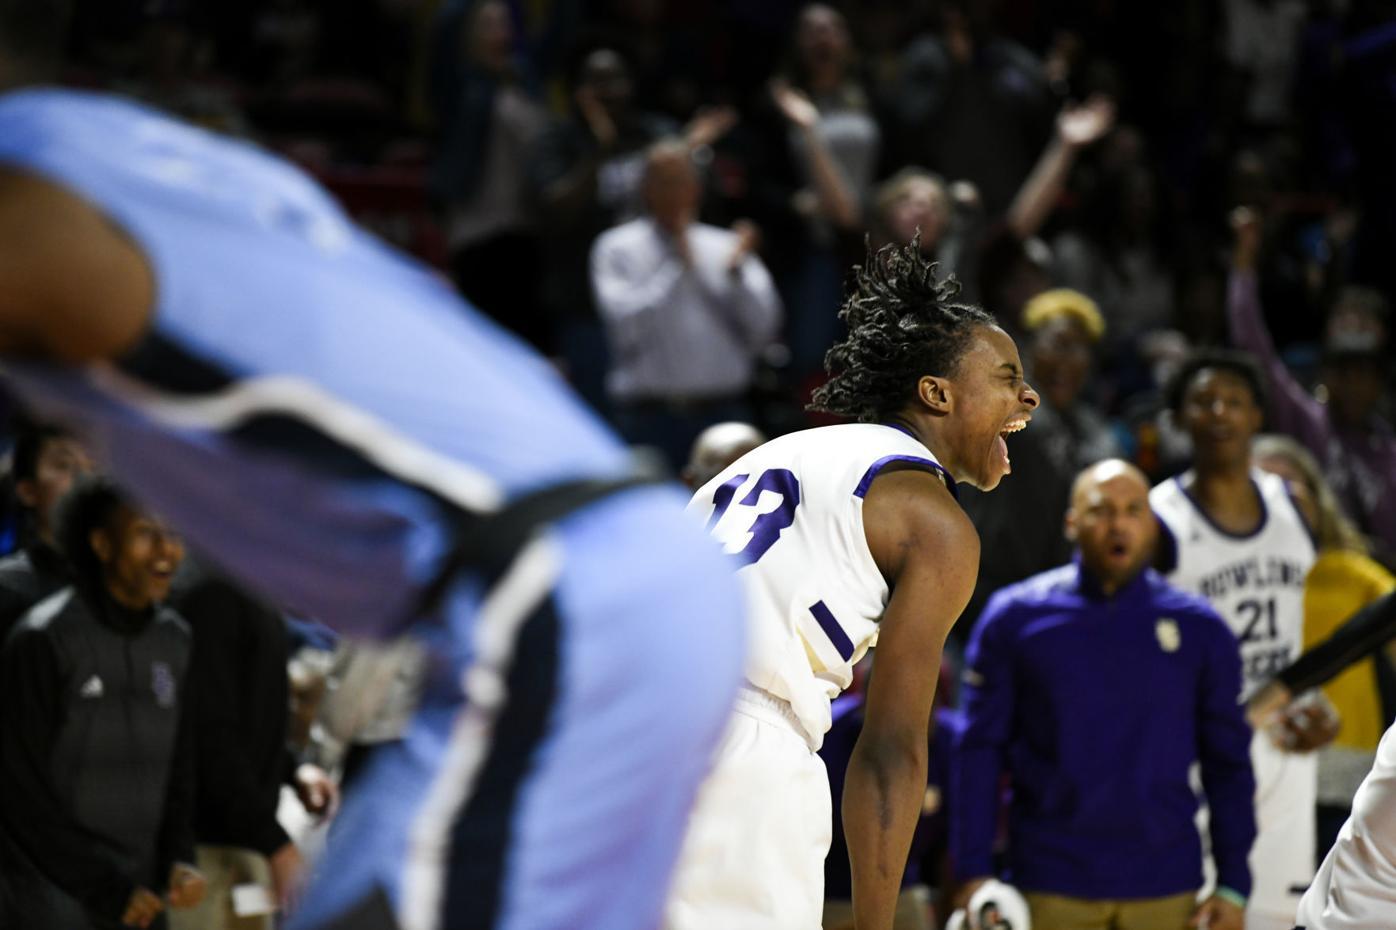 Purples advance to the region final